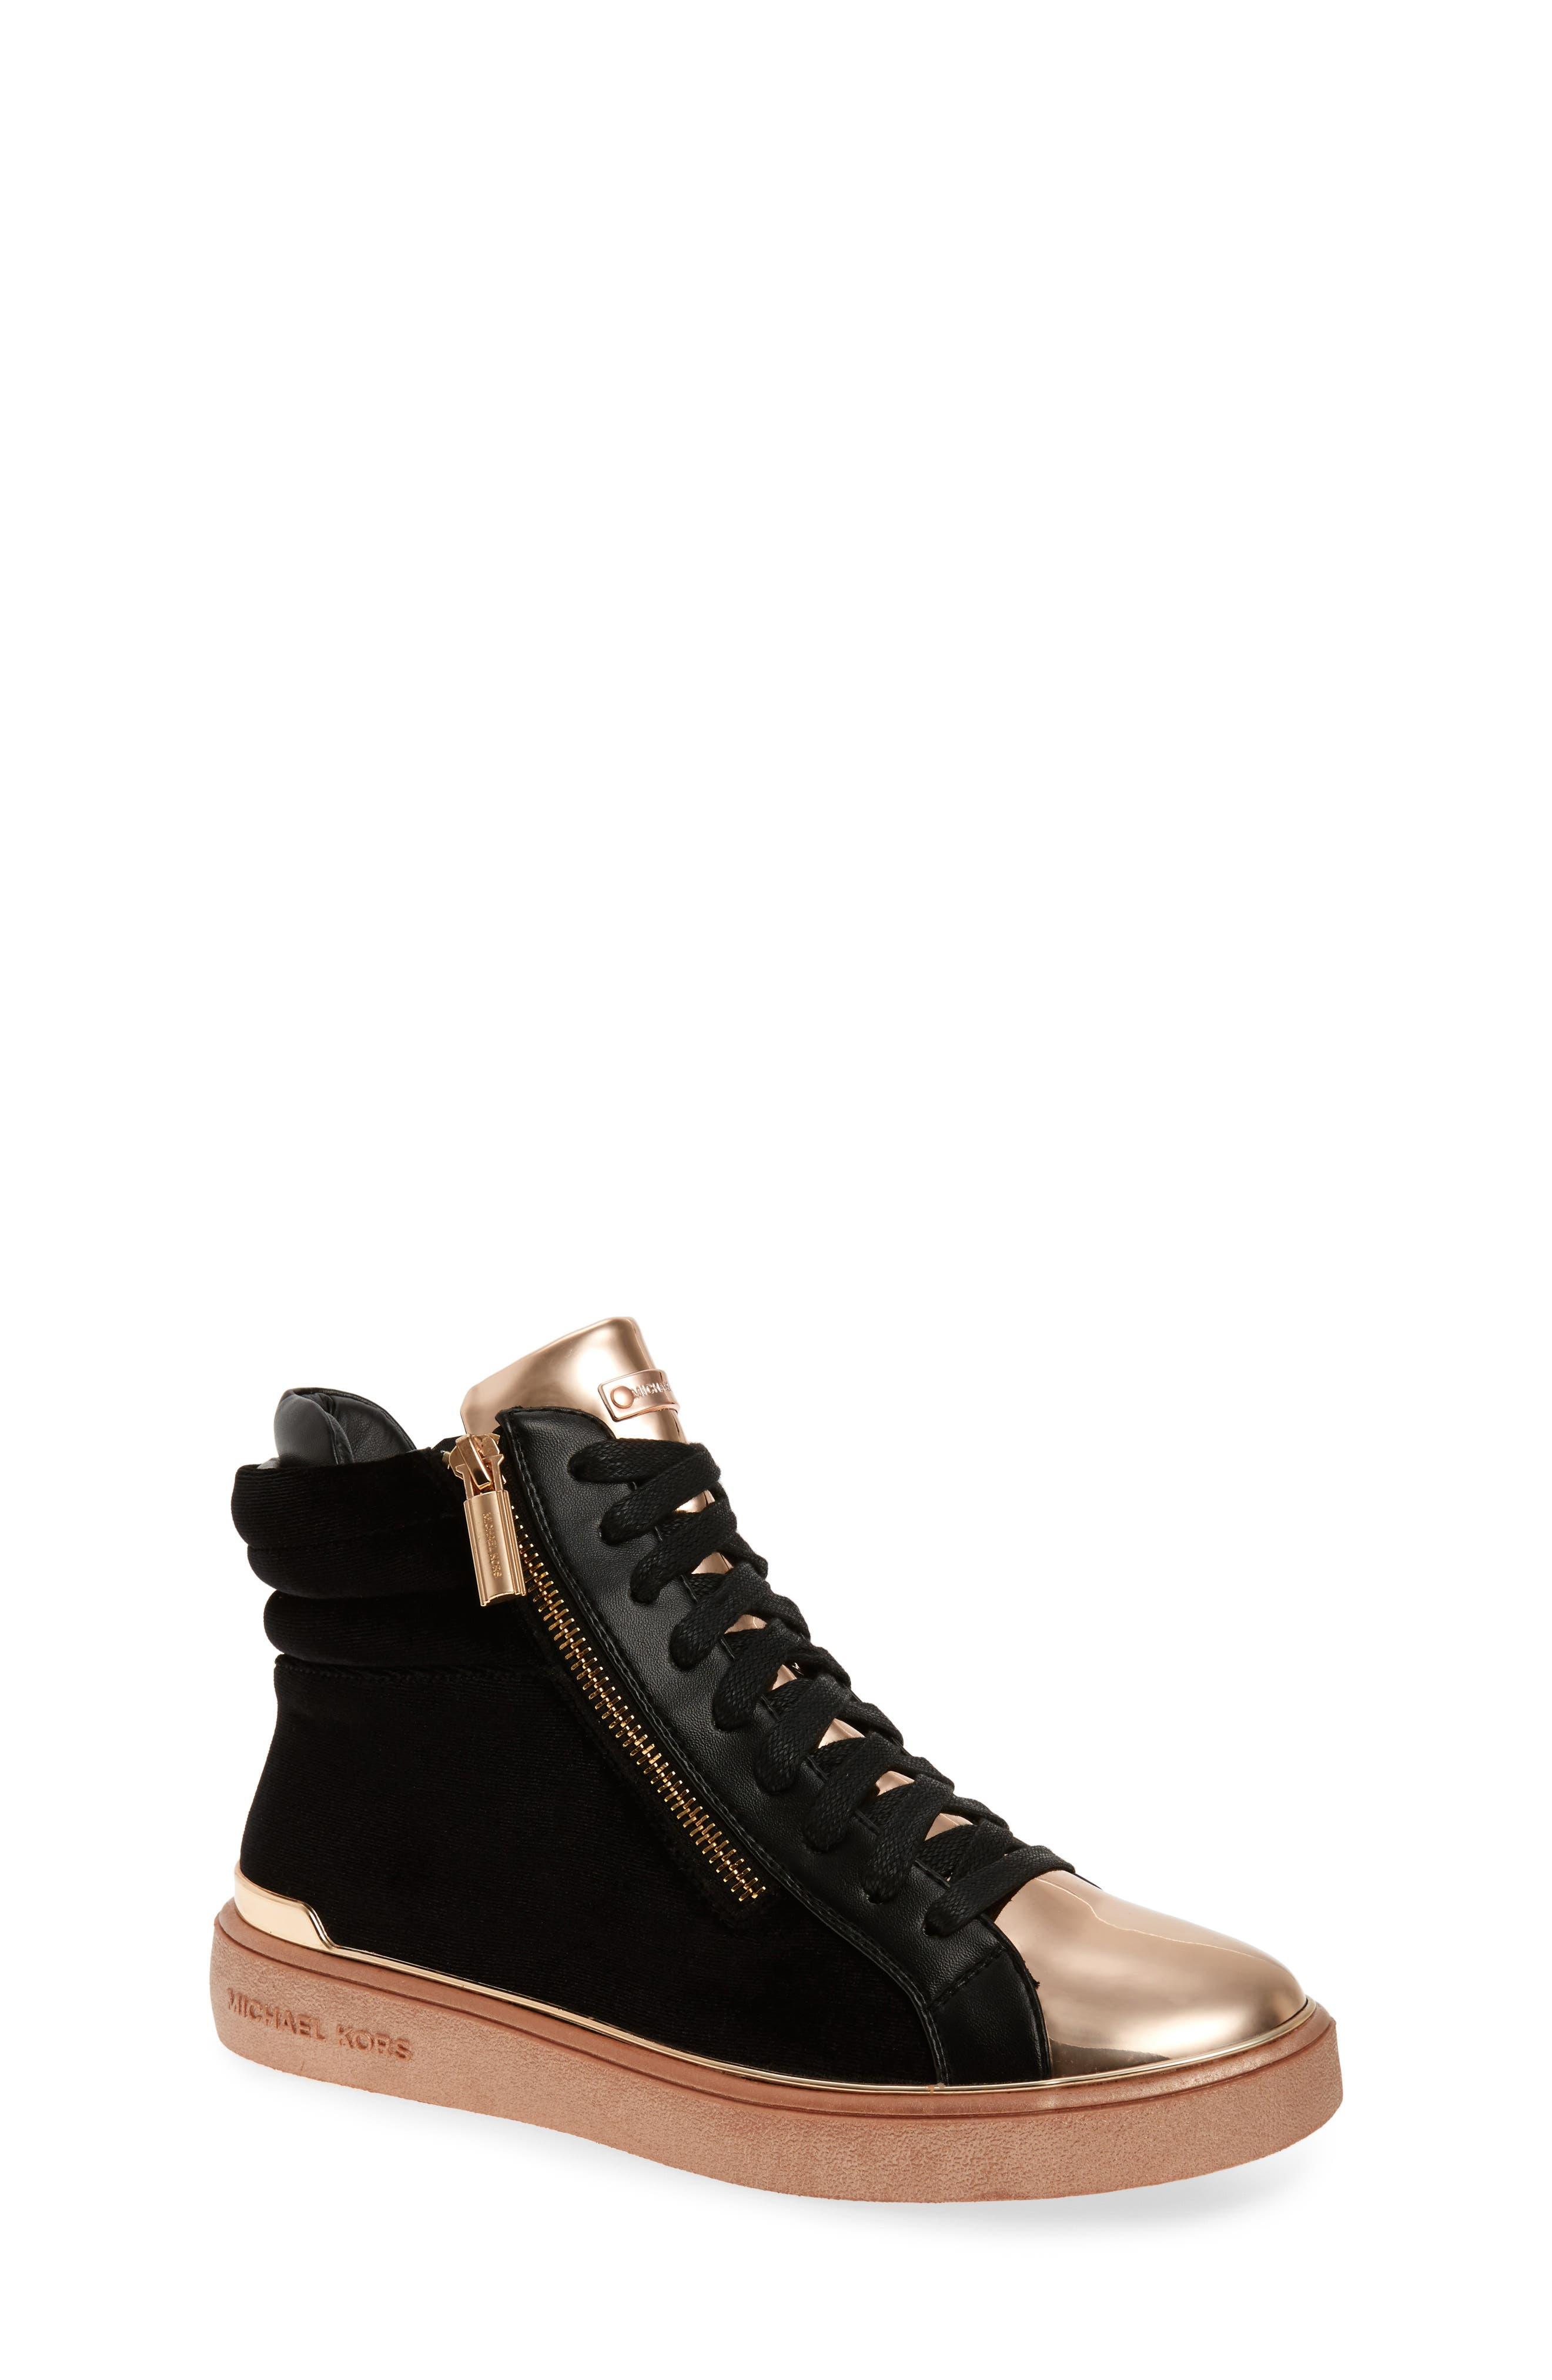 MICHAEL Michael Kors Ivy Blue High Top Sneaker (Walker, Toddler, Little Kid & Big Kid)